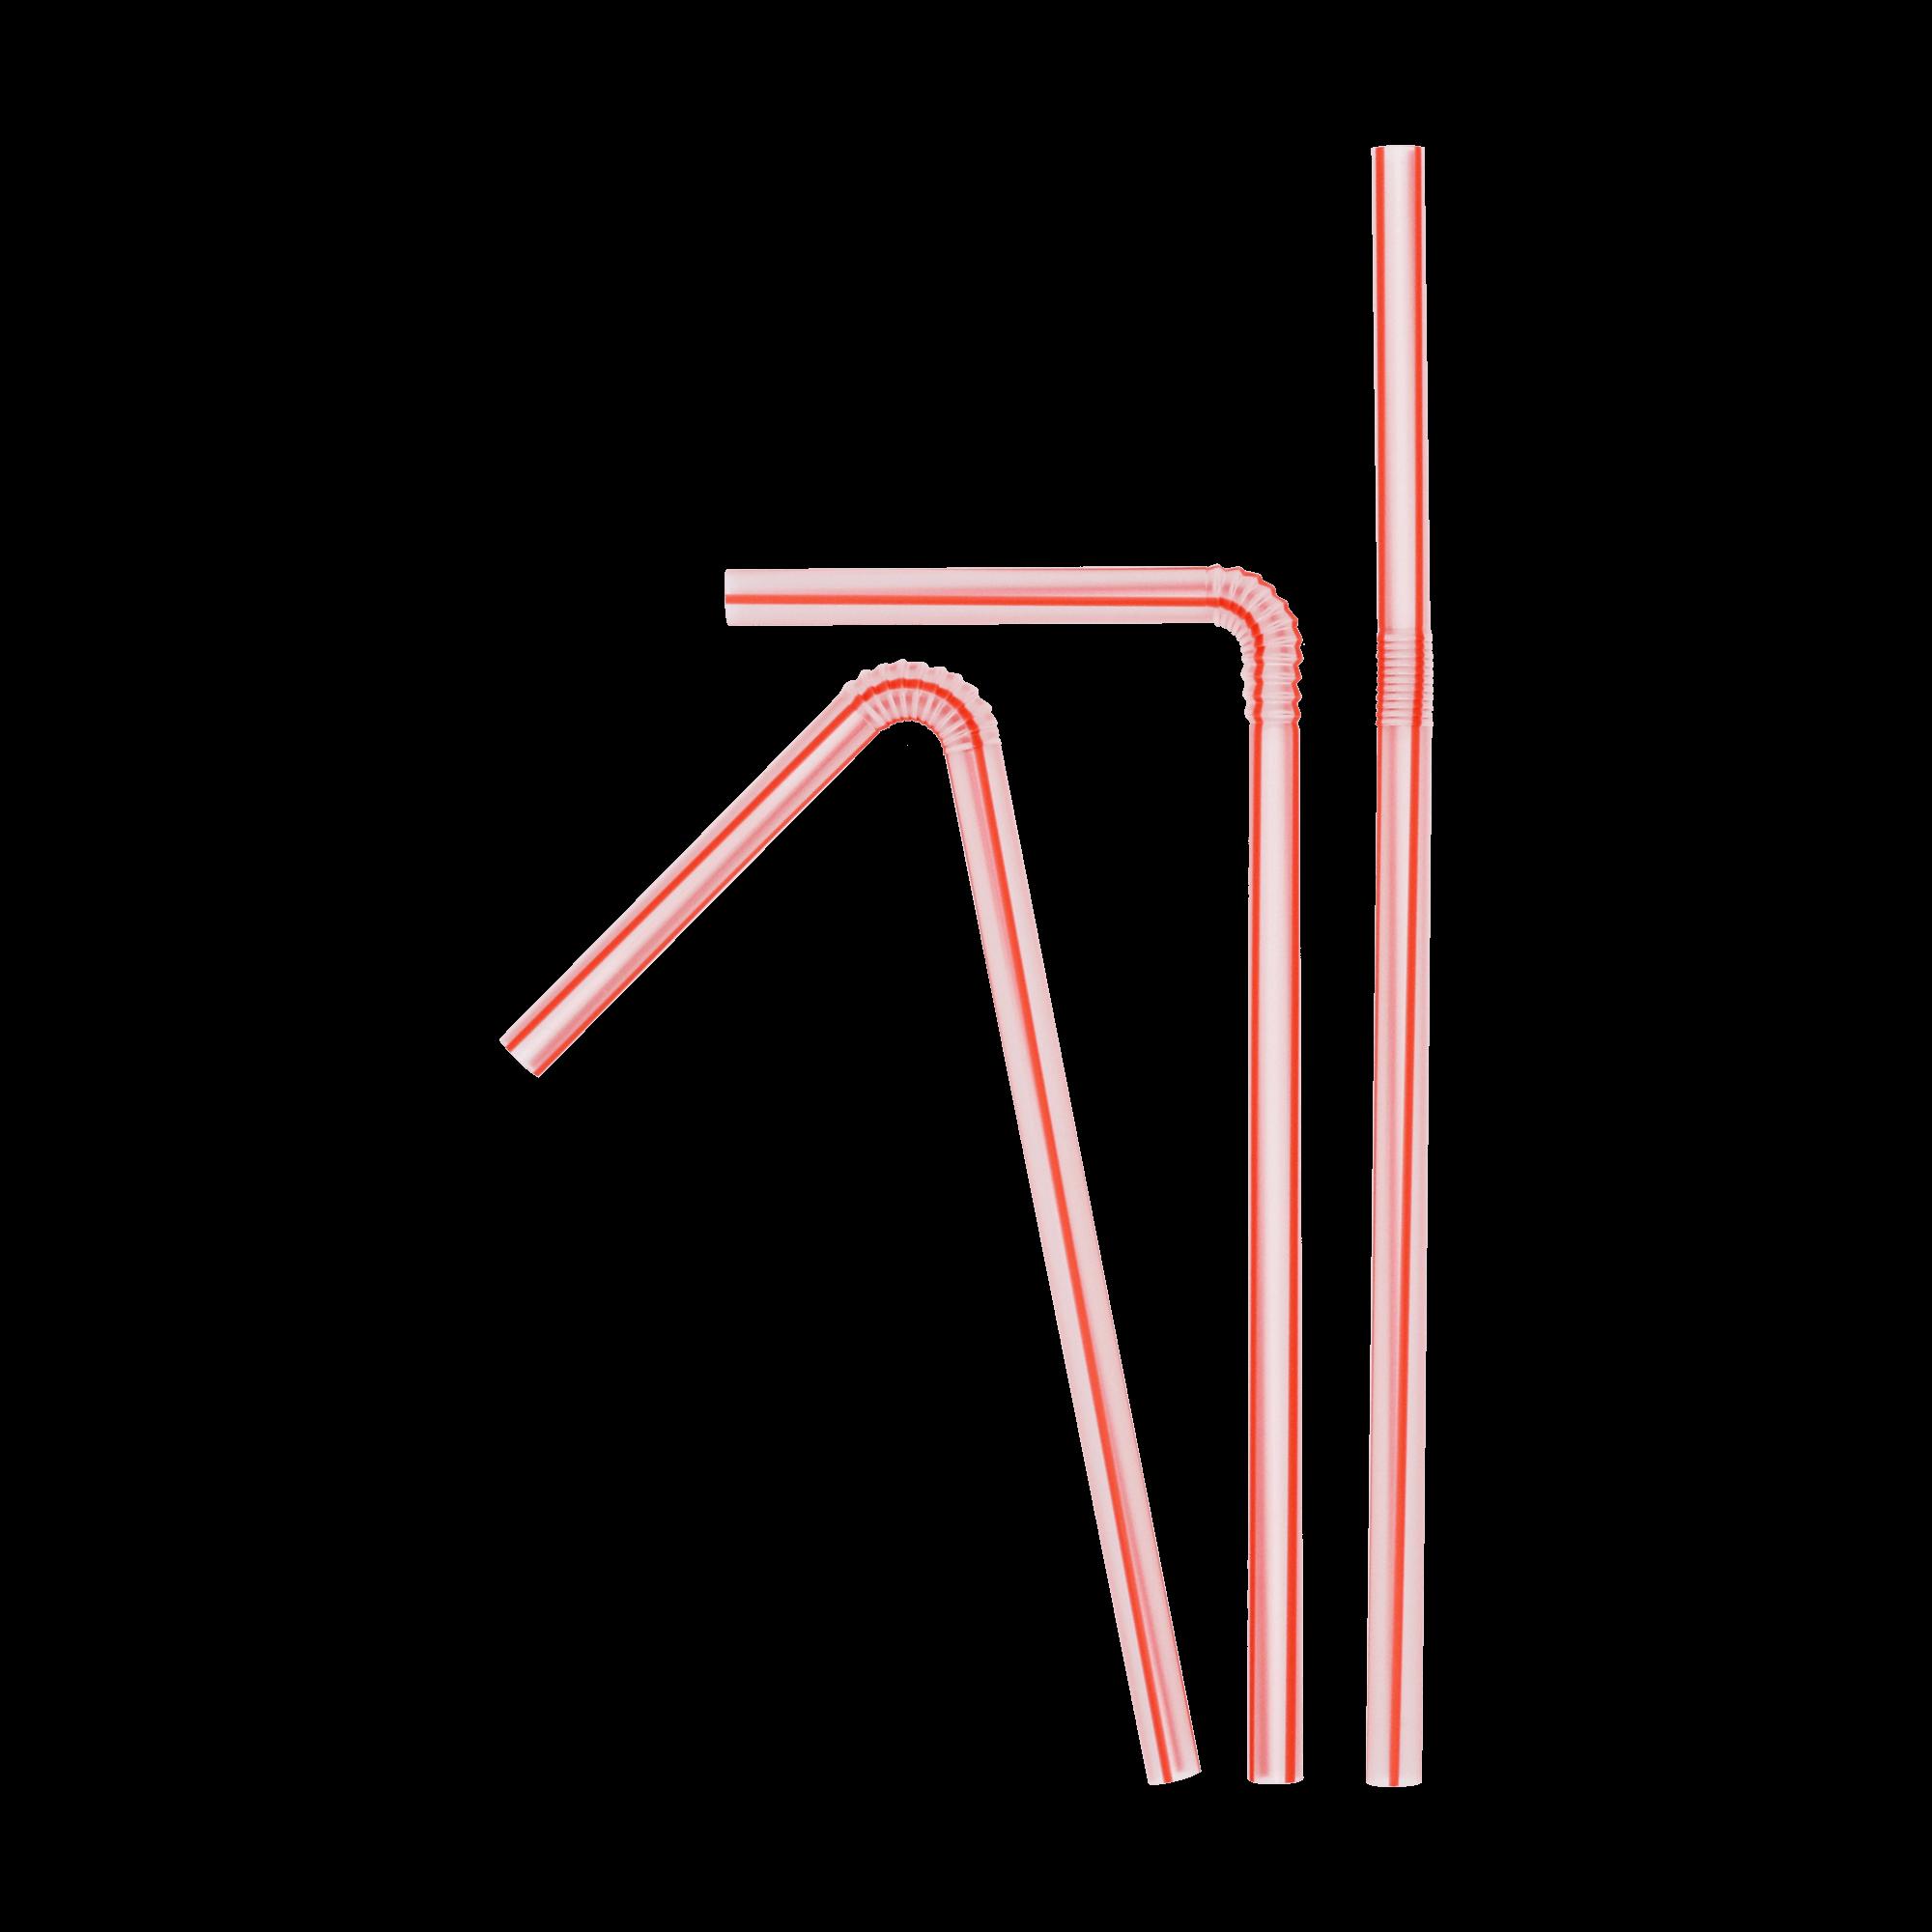 SUNMUM Baby Soft Flexible Straw